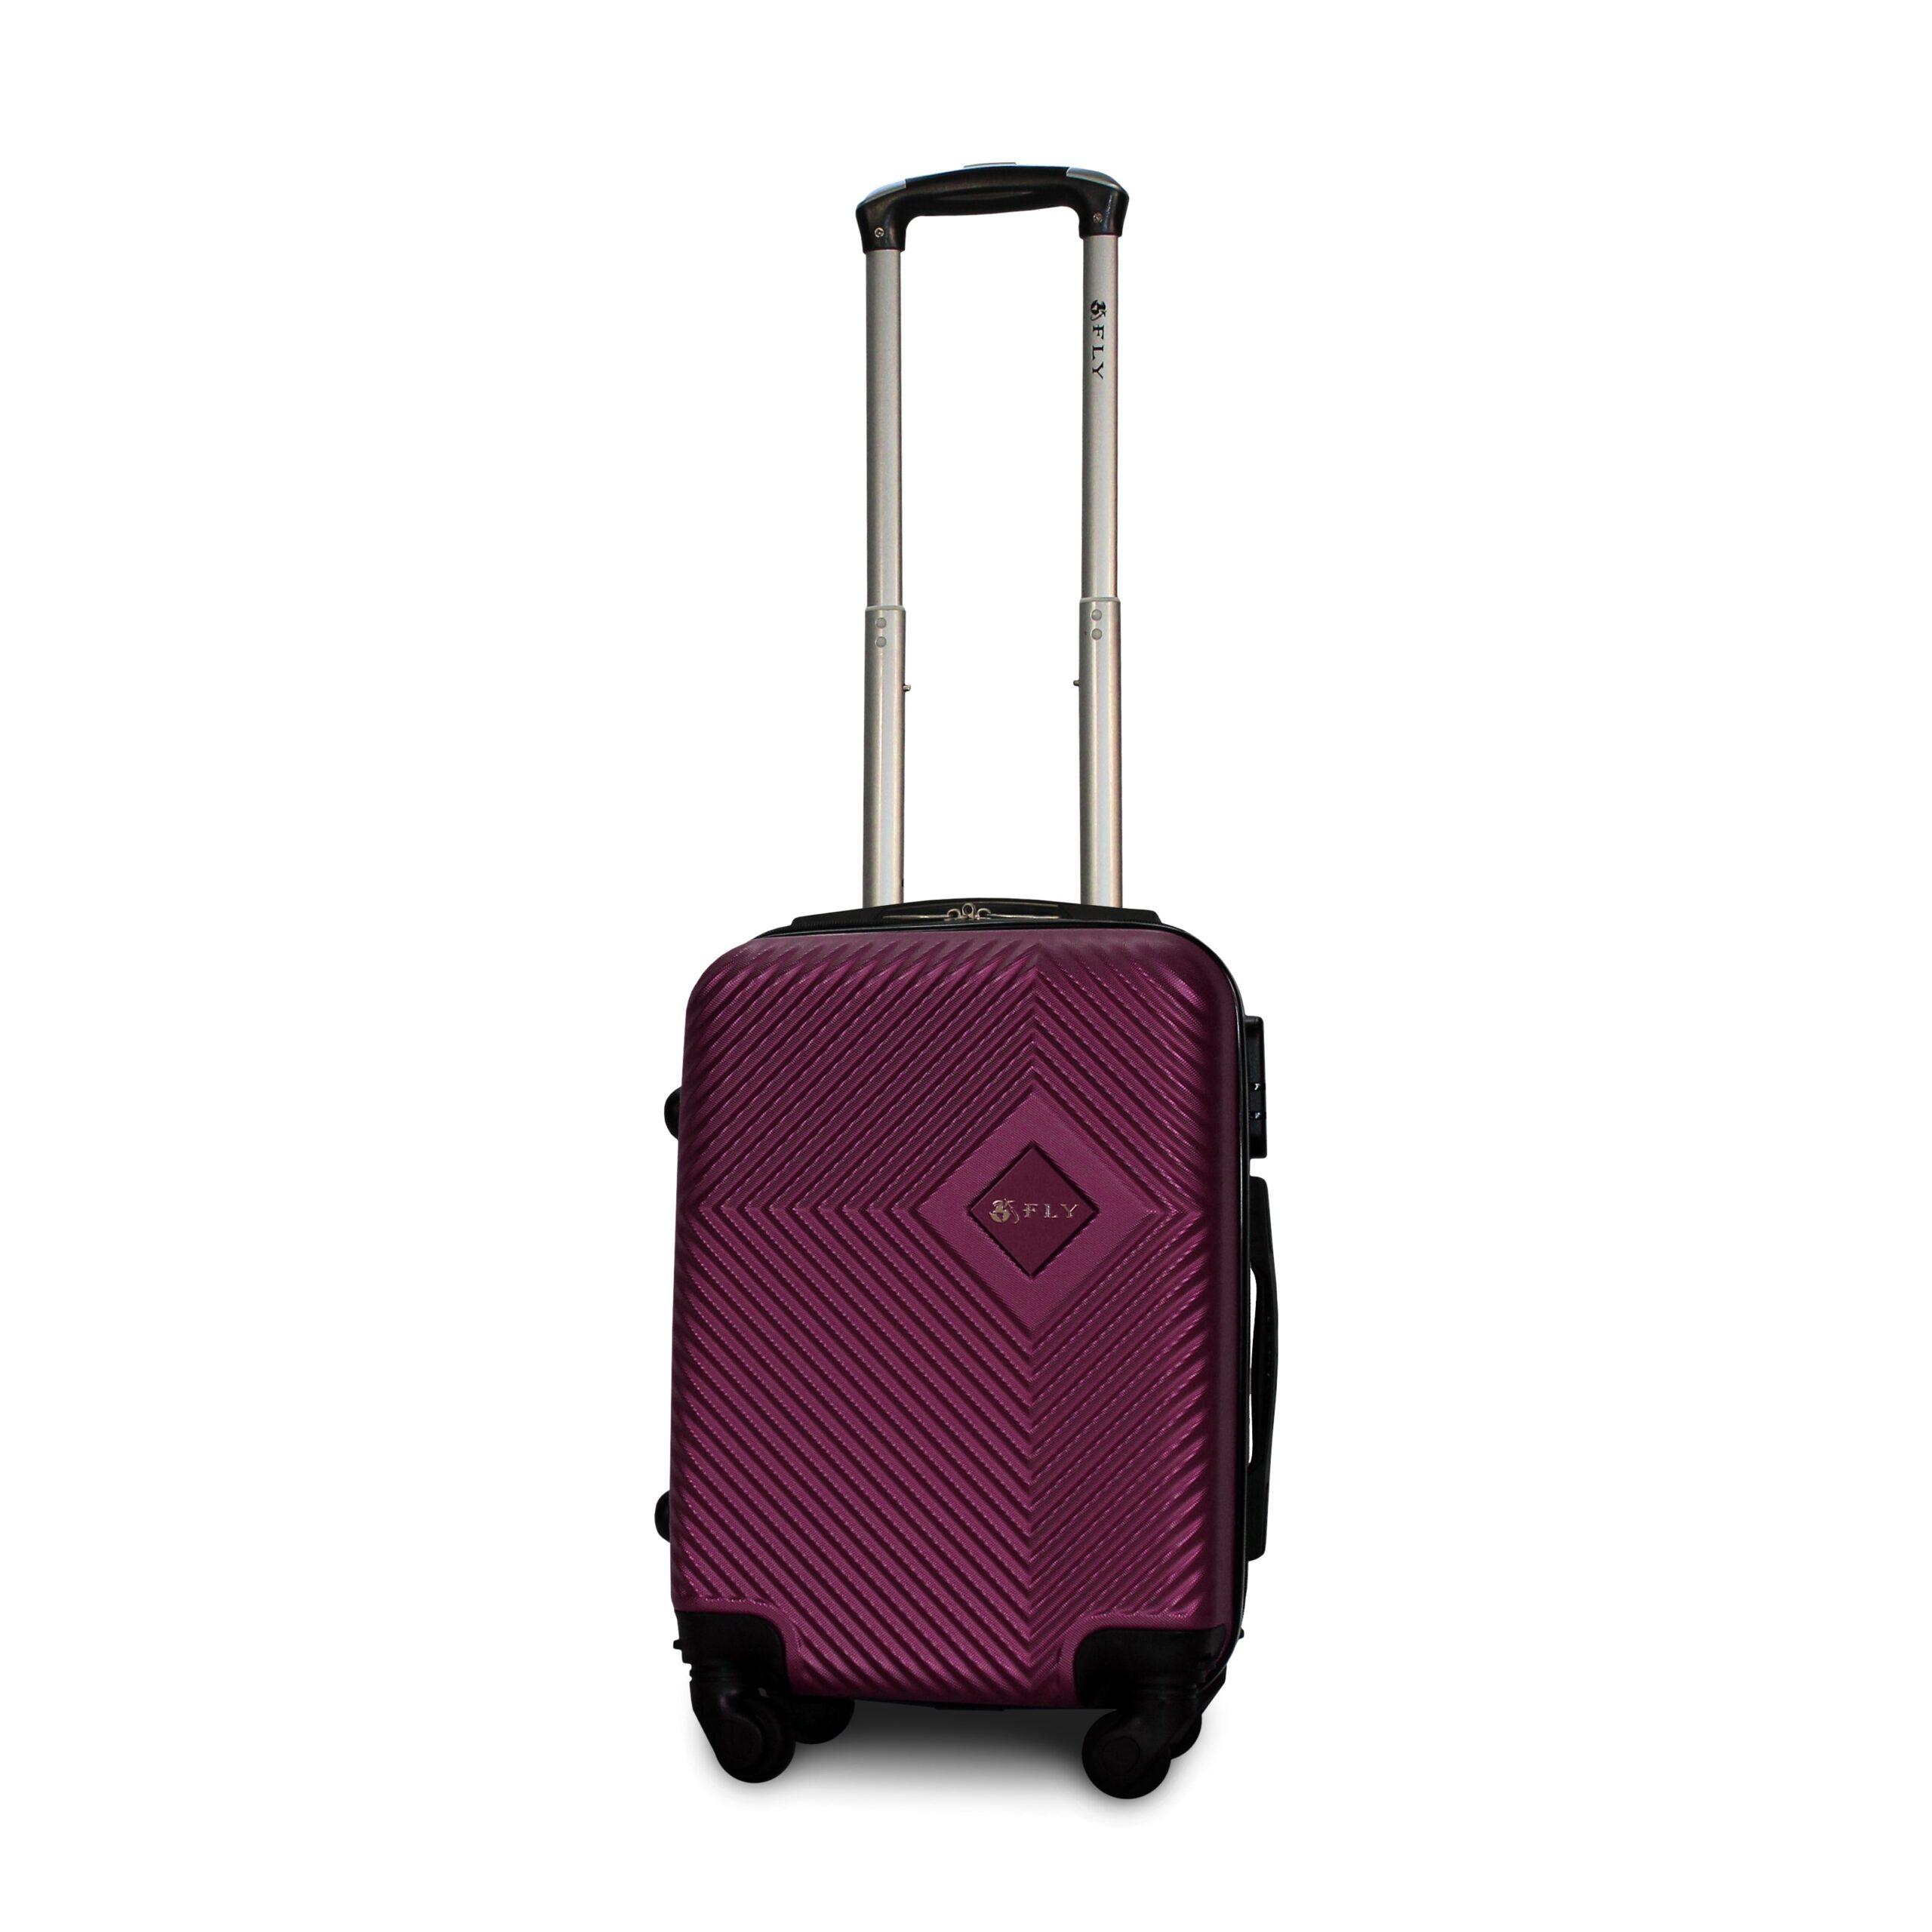 Мини чемодан (XS) Fly 2130 | пластиковый